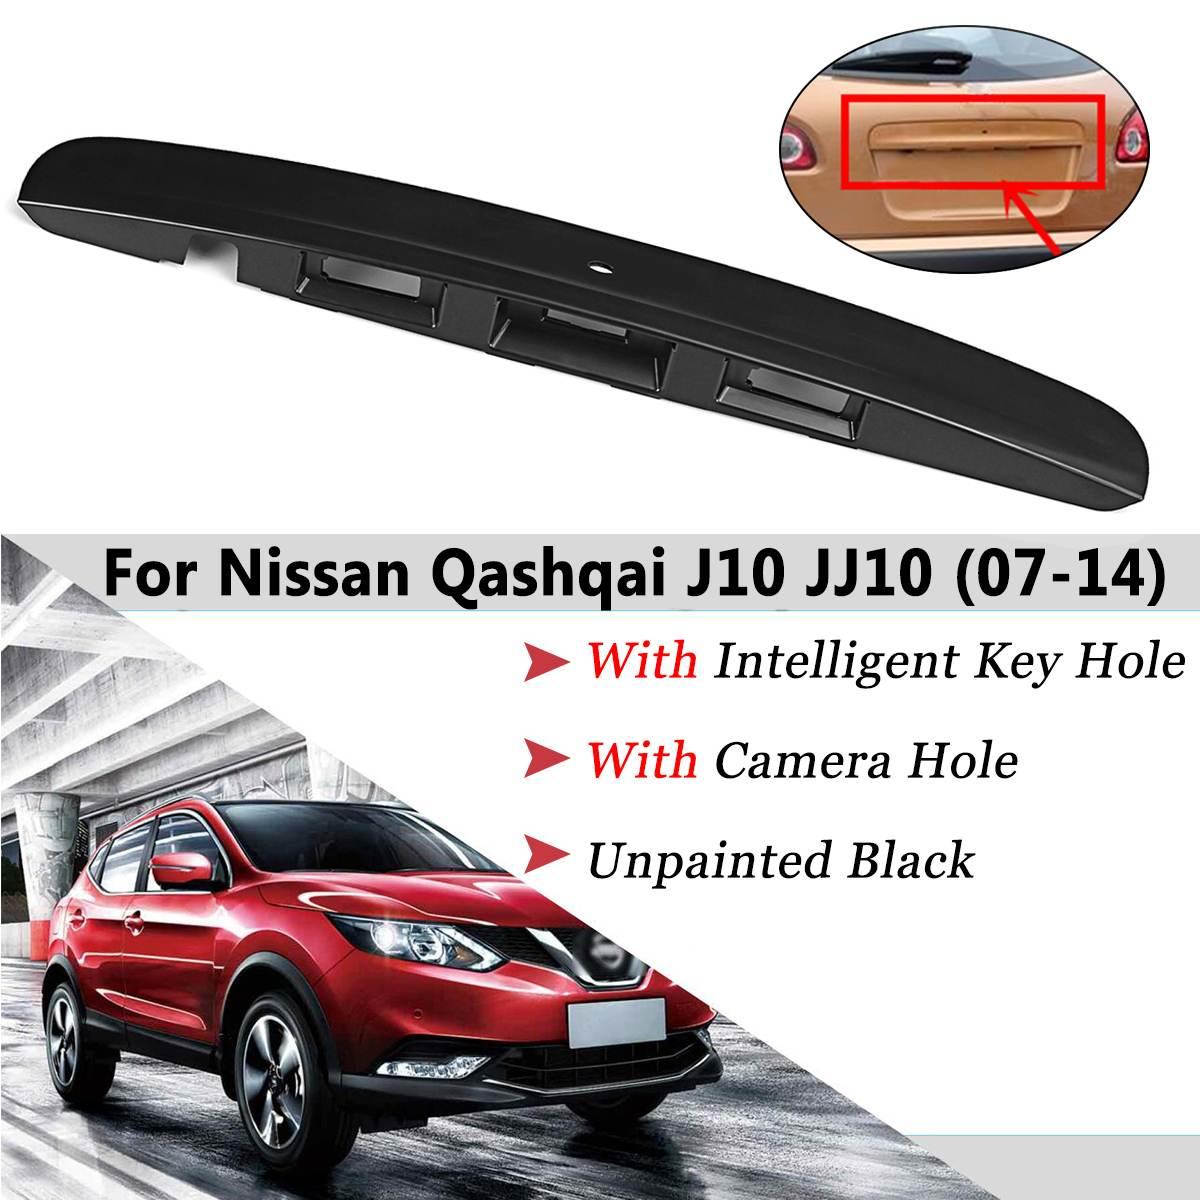 Bota traseiro Tailgate Porta Grab Handle Guarnição da Tampa J10 JJ10 Furo chave Para Nissan Qashqai 2007 2008 2009 2010 2011 2012 2013 2014